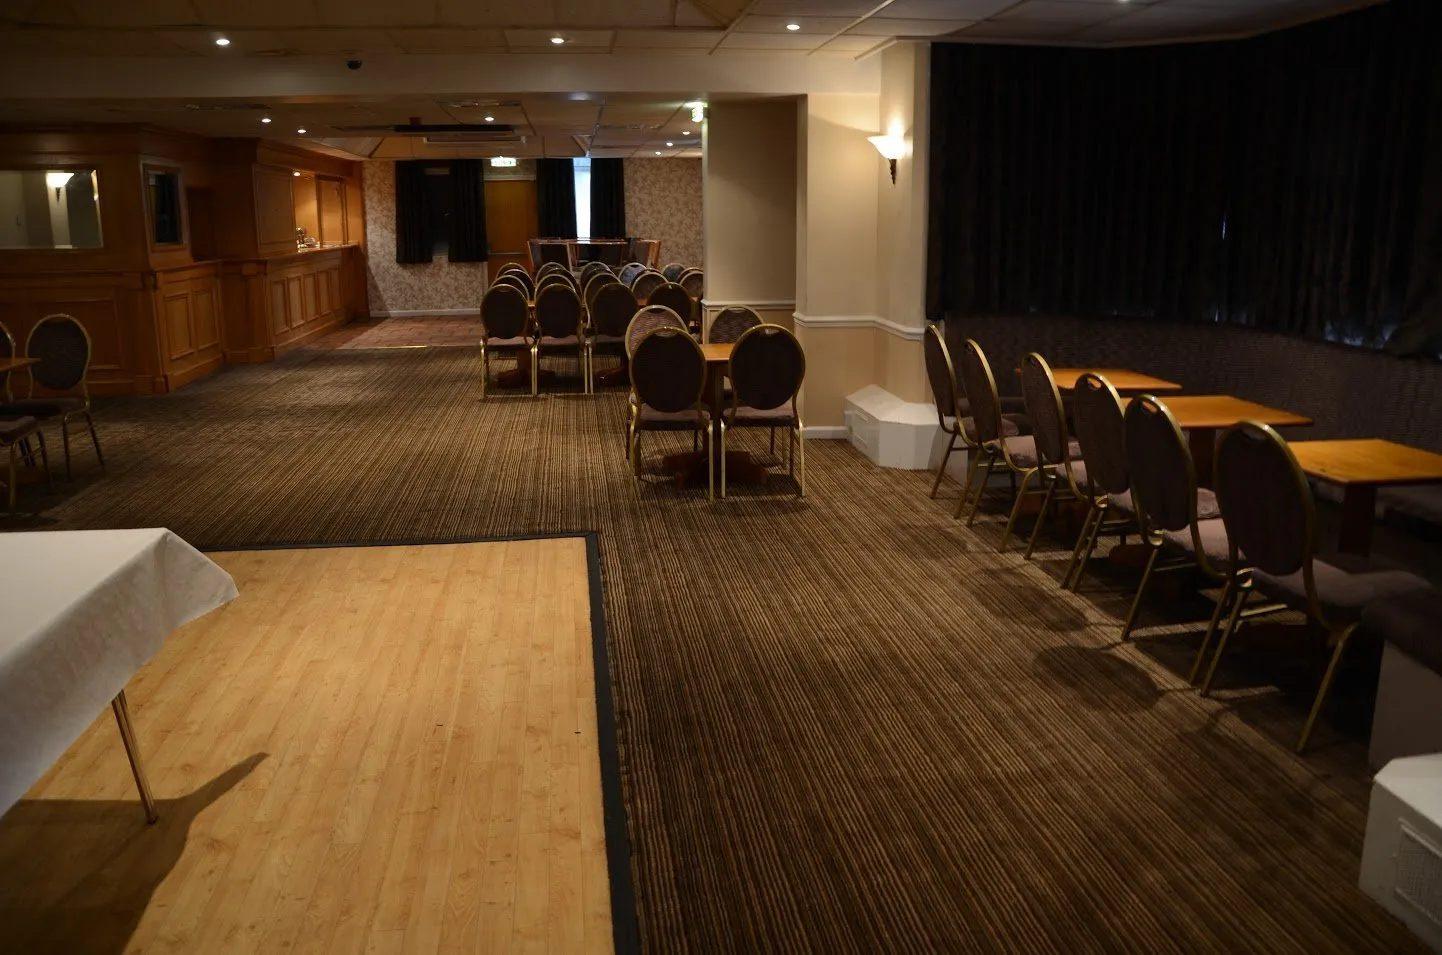 Low lighting in Standard Triumph Club function room